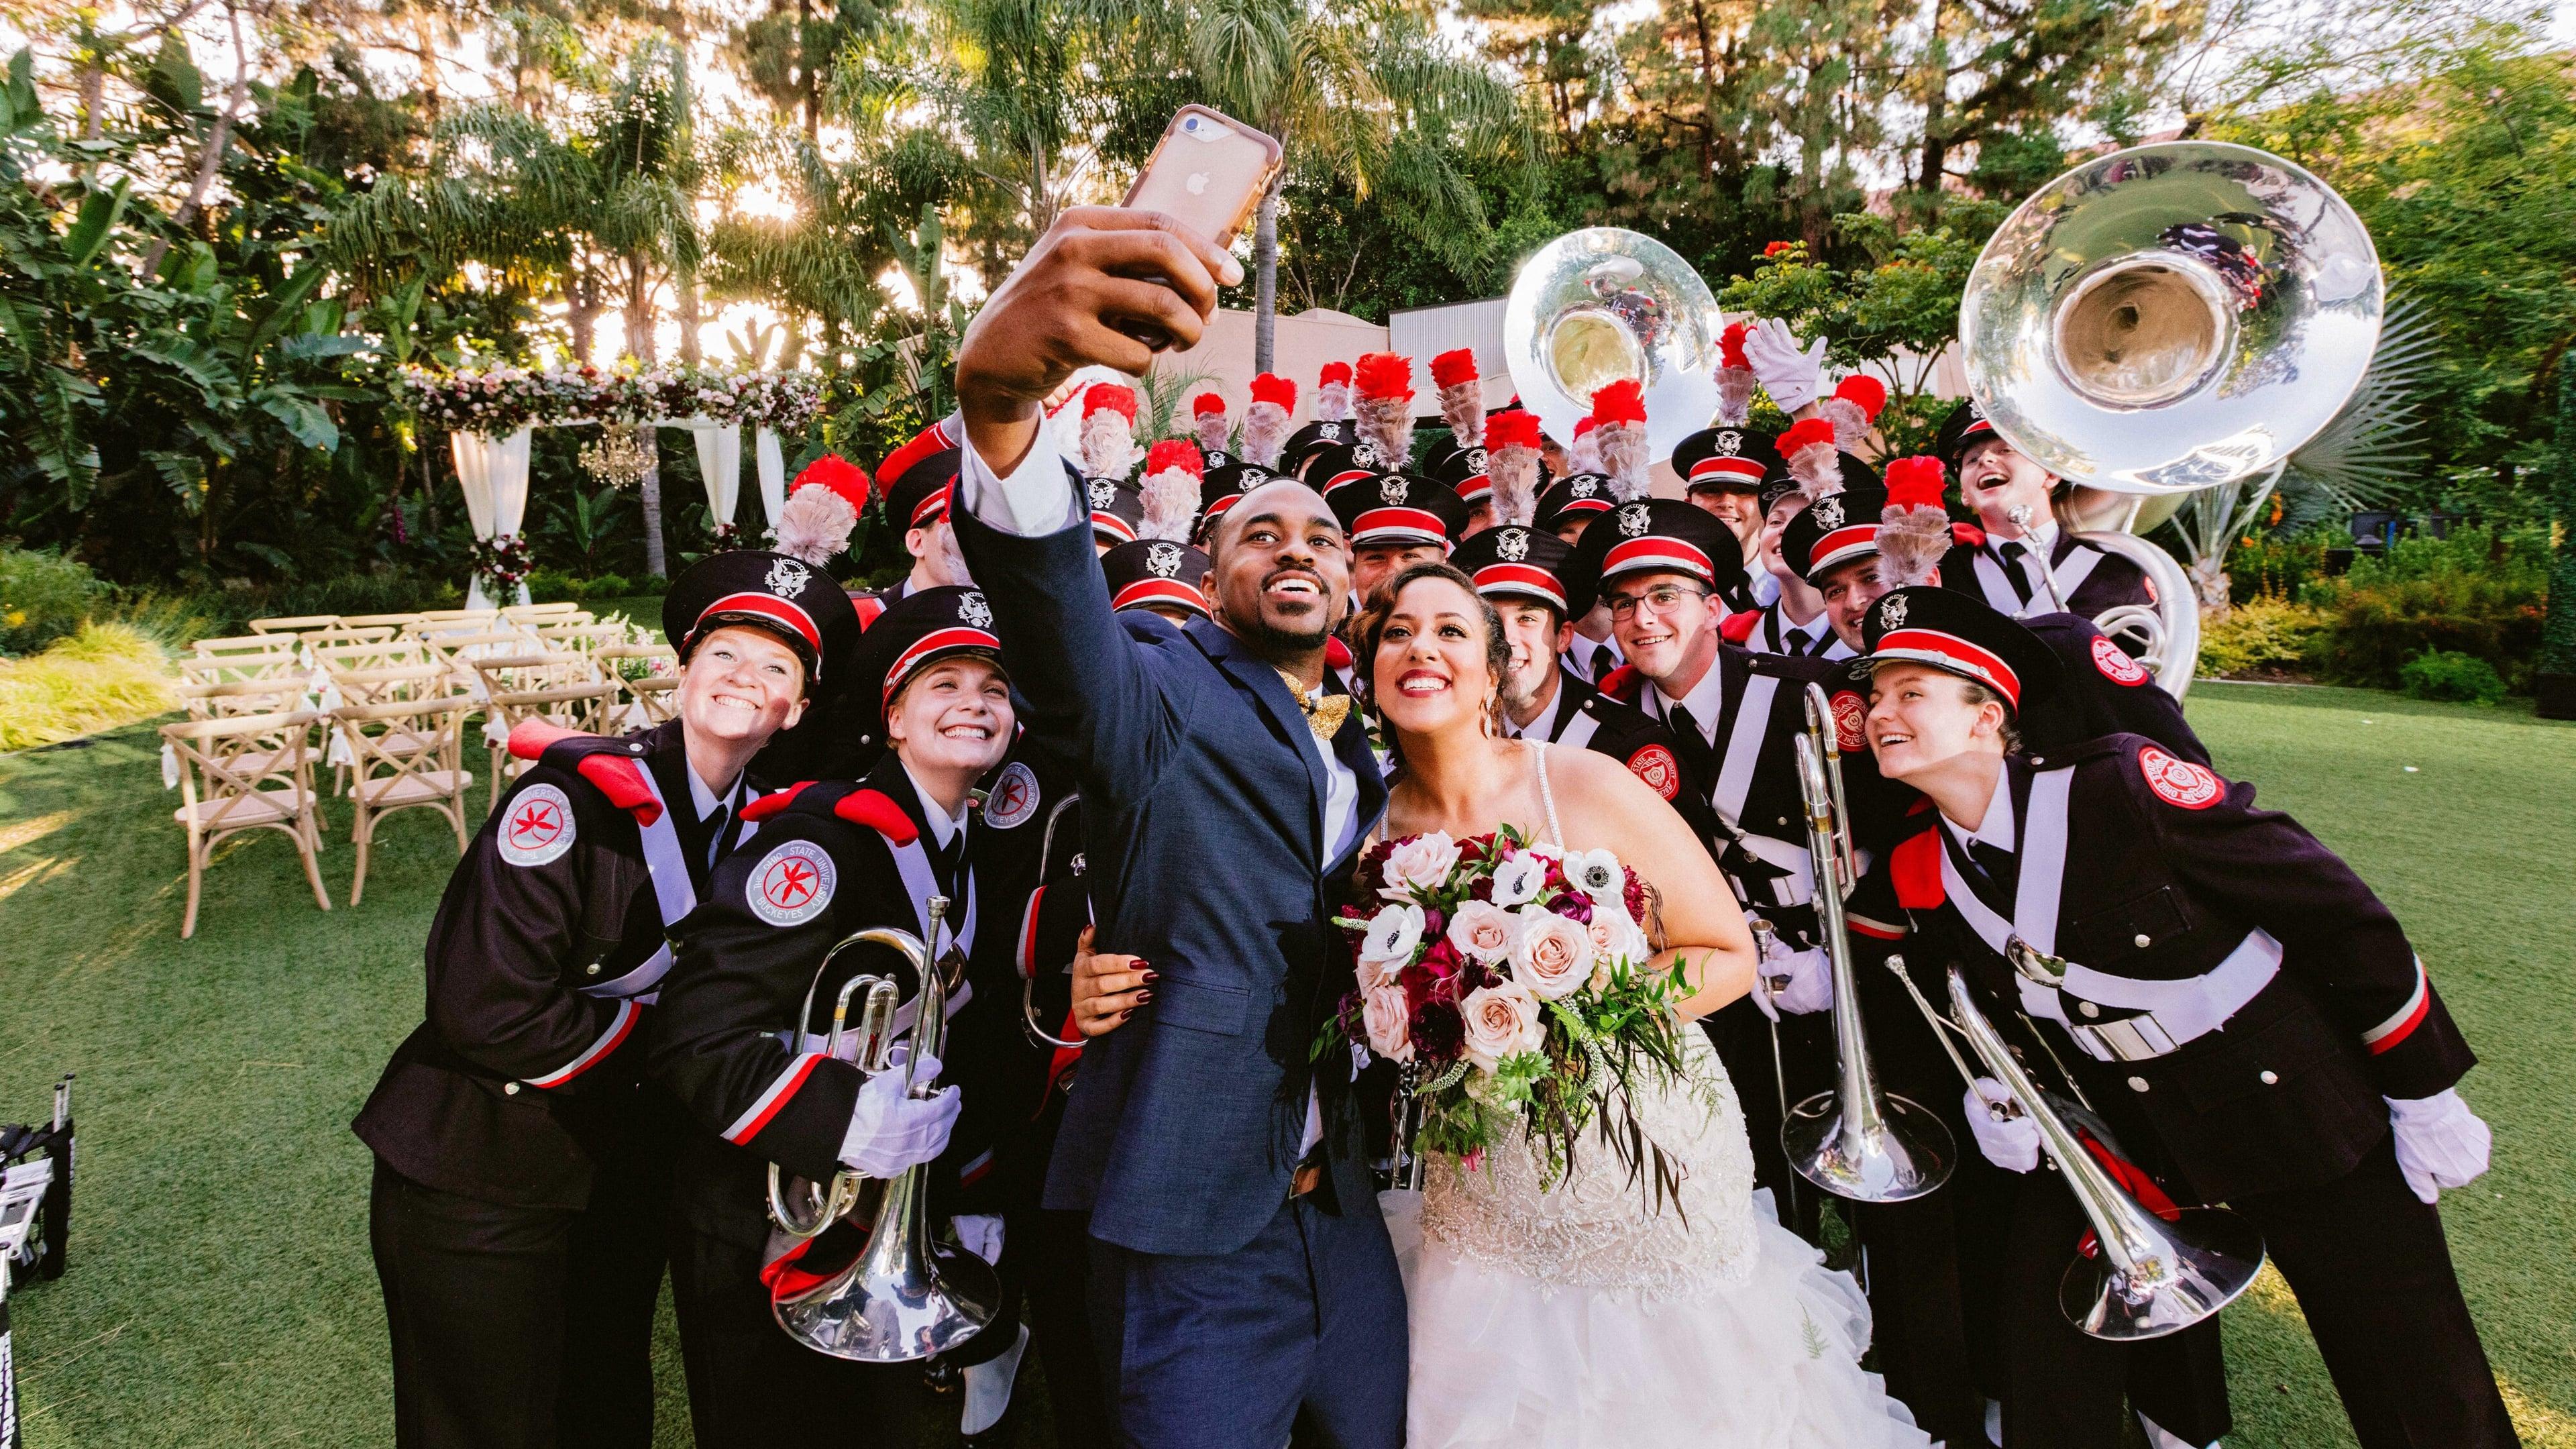 Disney's Fairy Tale Weddings - Season 2 Episode 1 : Marching Down the Aisle